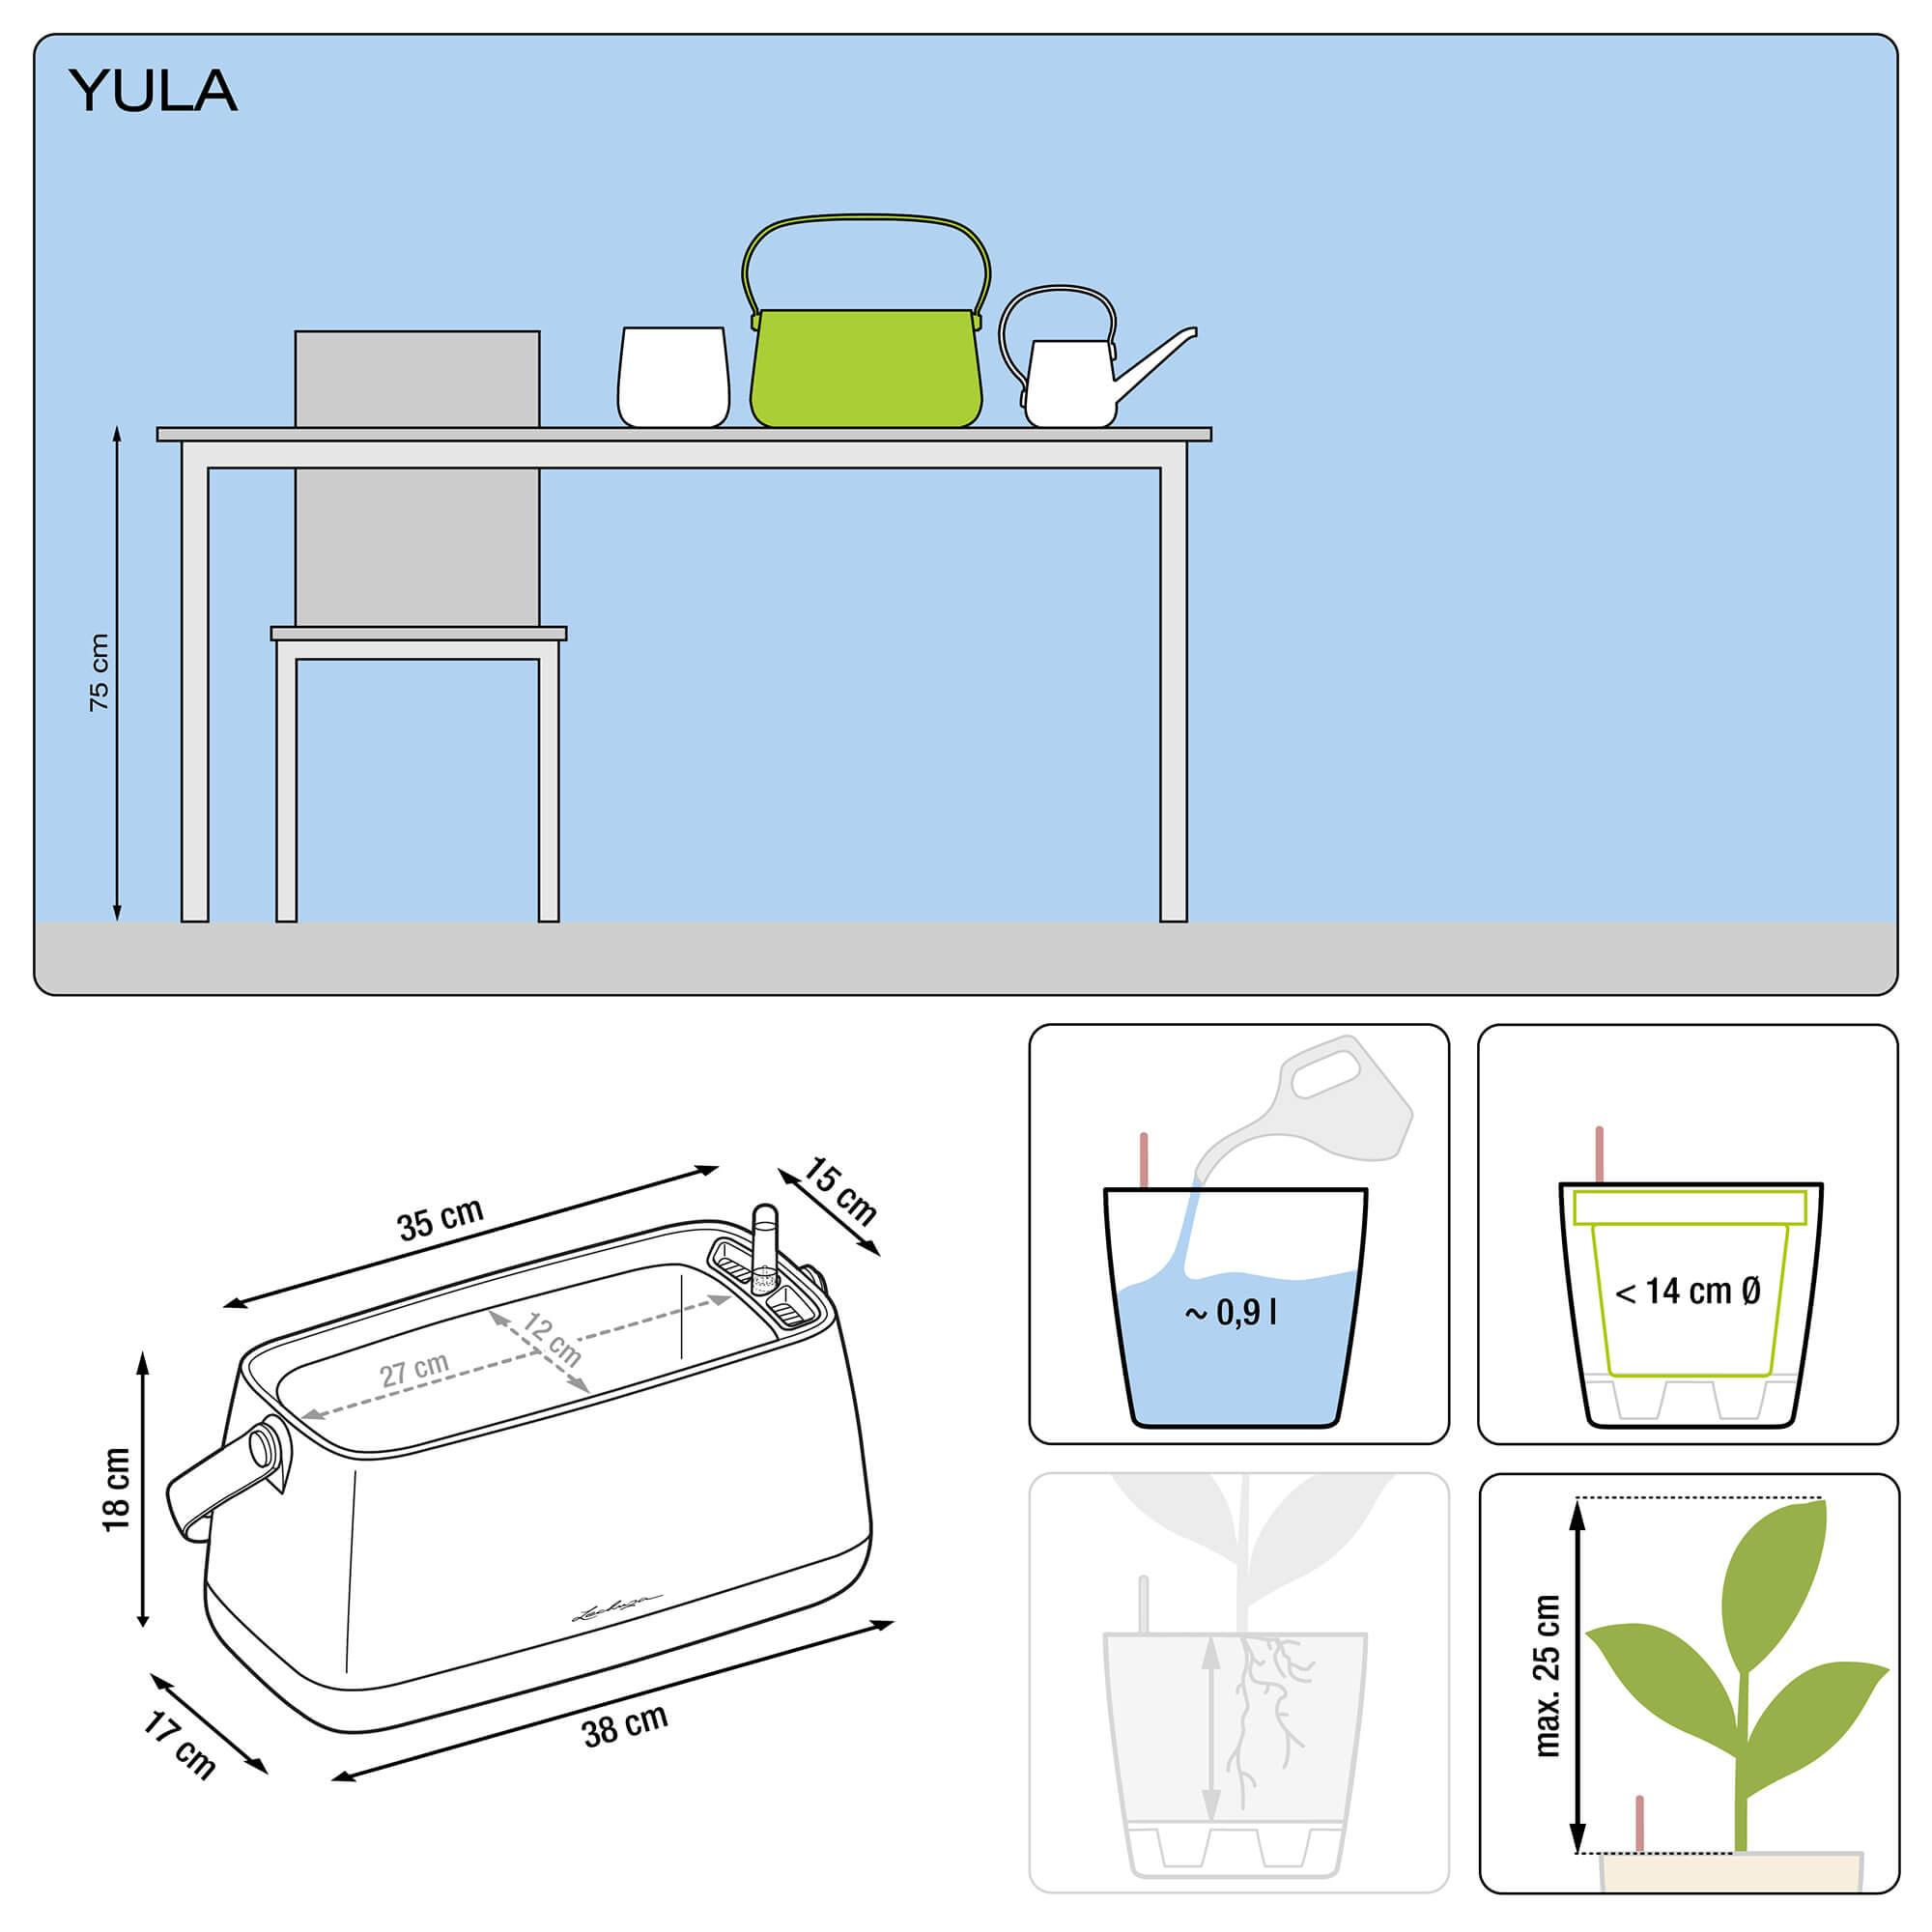 YULA plant bag white/gray semi-gloss - Image 2